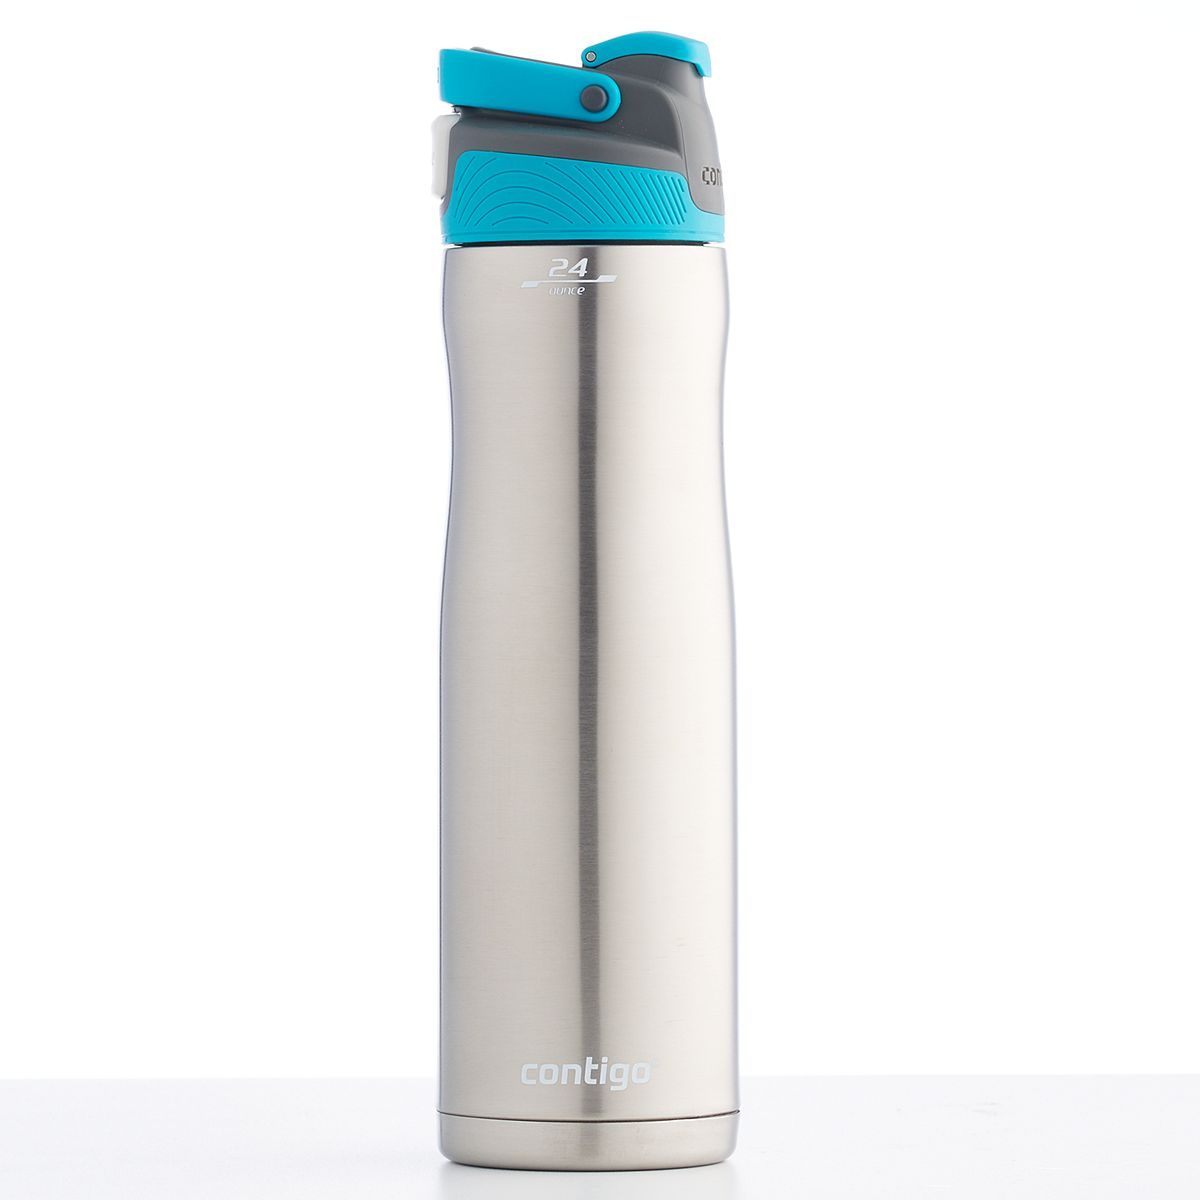 Kohl's: Contigo AUTOSEAL Chill 24-oz. Stainless Steel Water Bottle $8.32